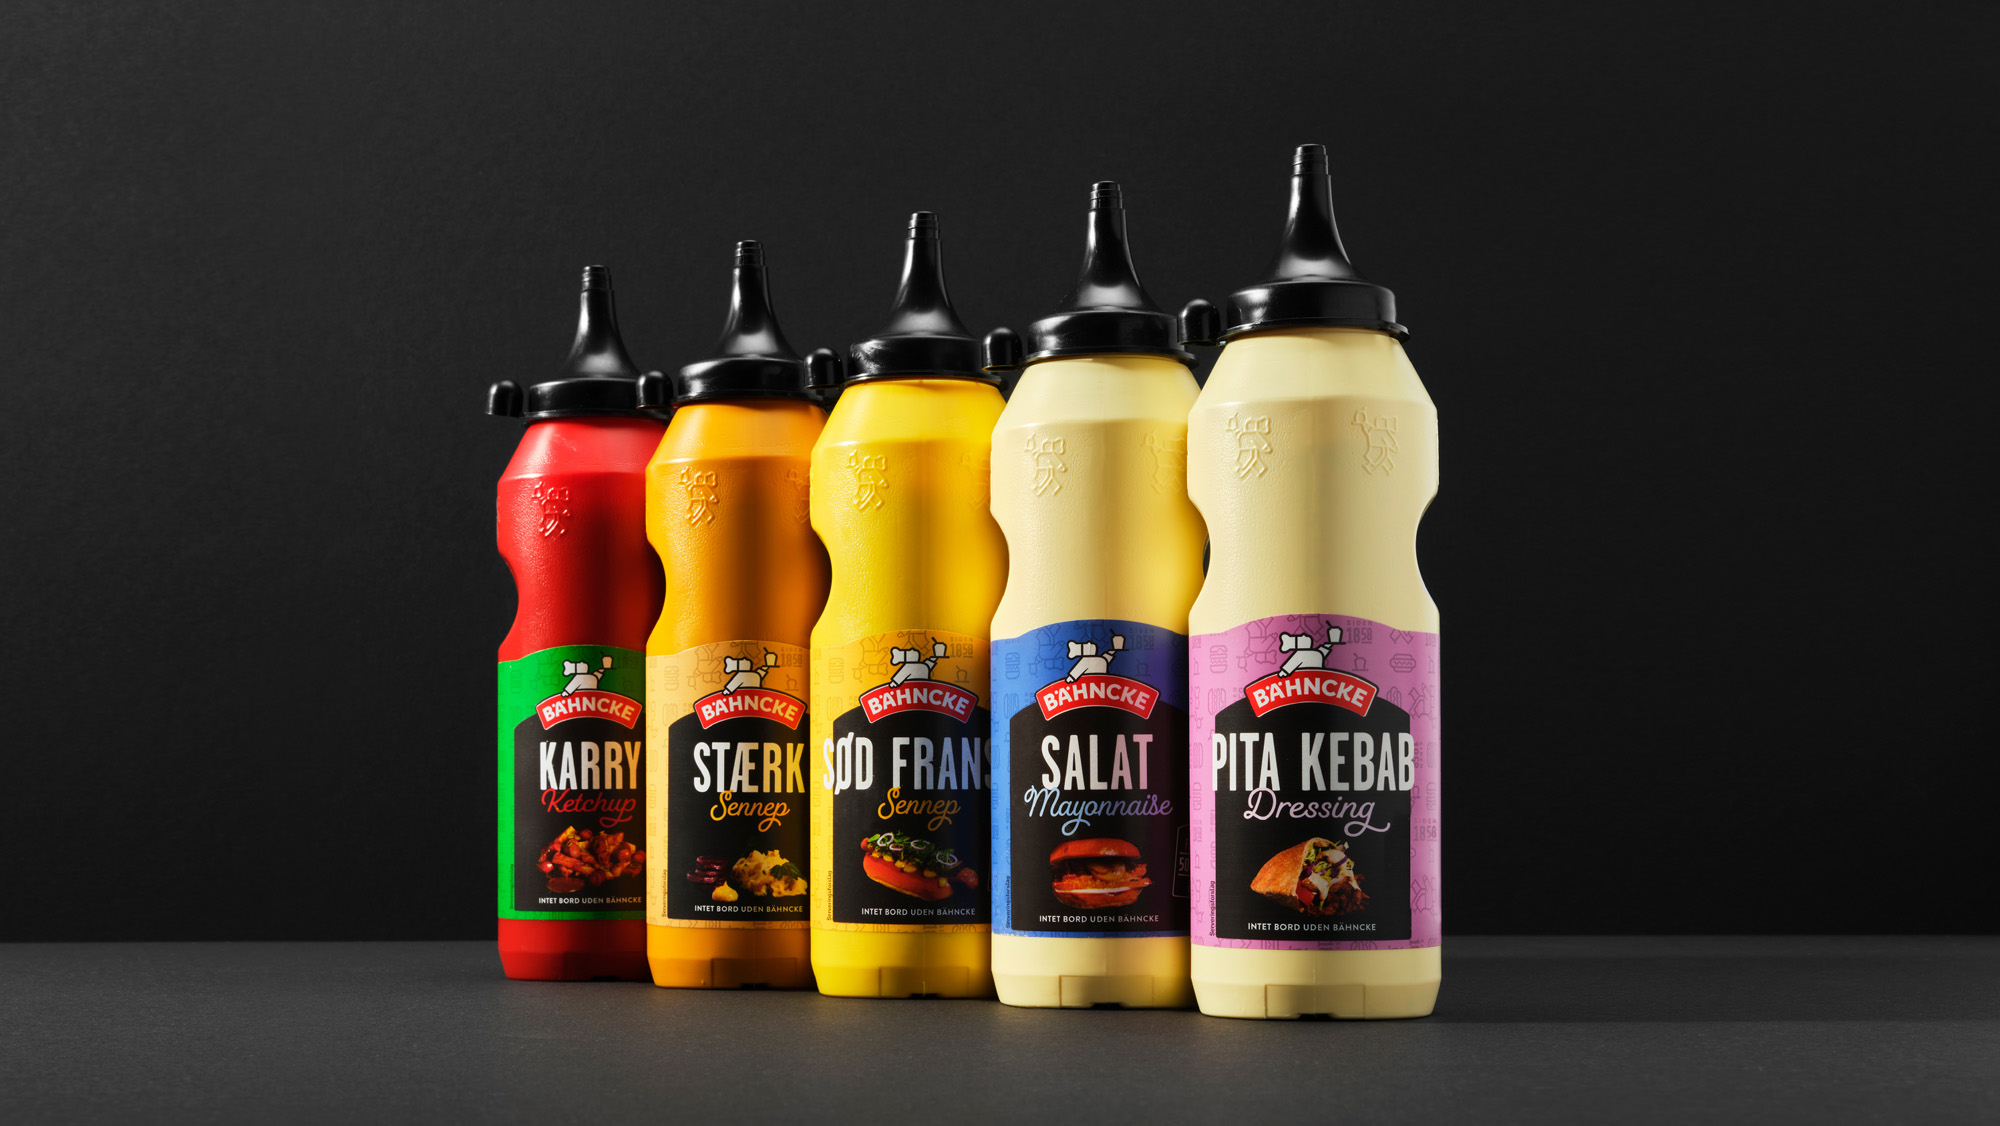 Everland Creates Packaging Design for Bähncke Fast-Food Sauce Brand